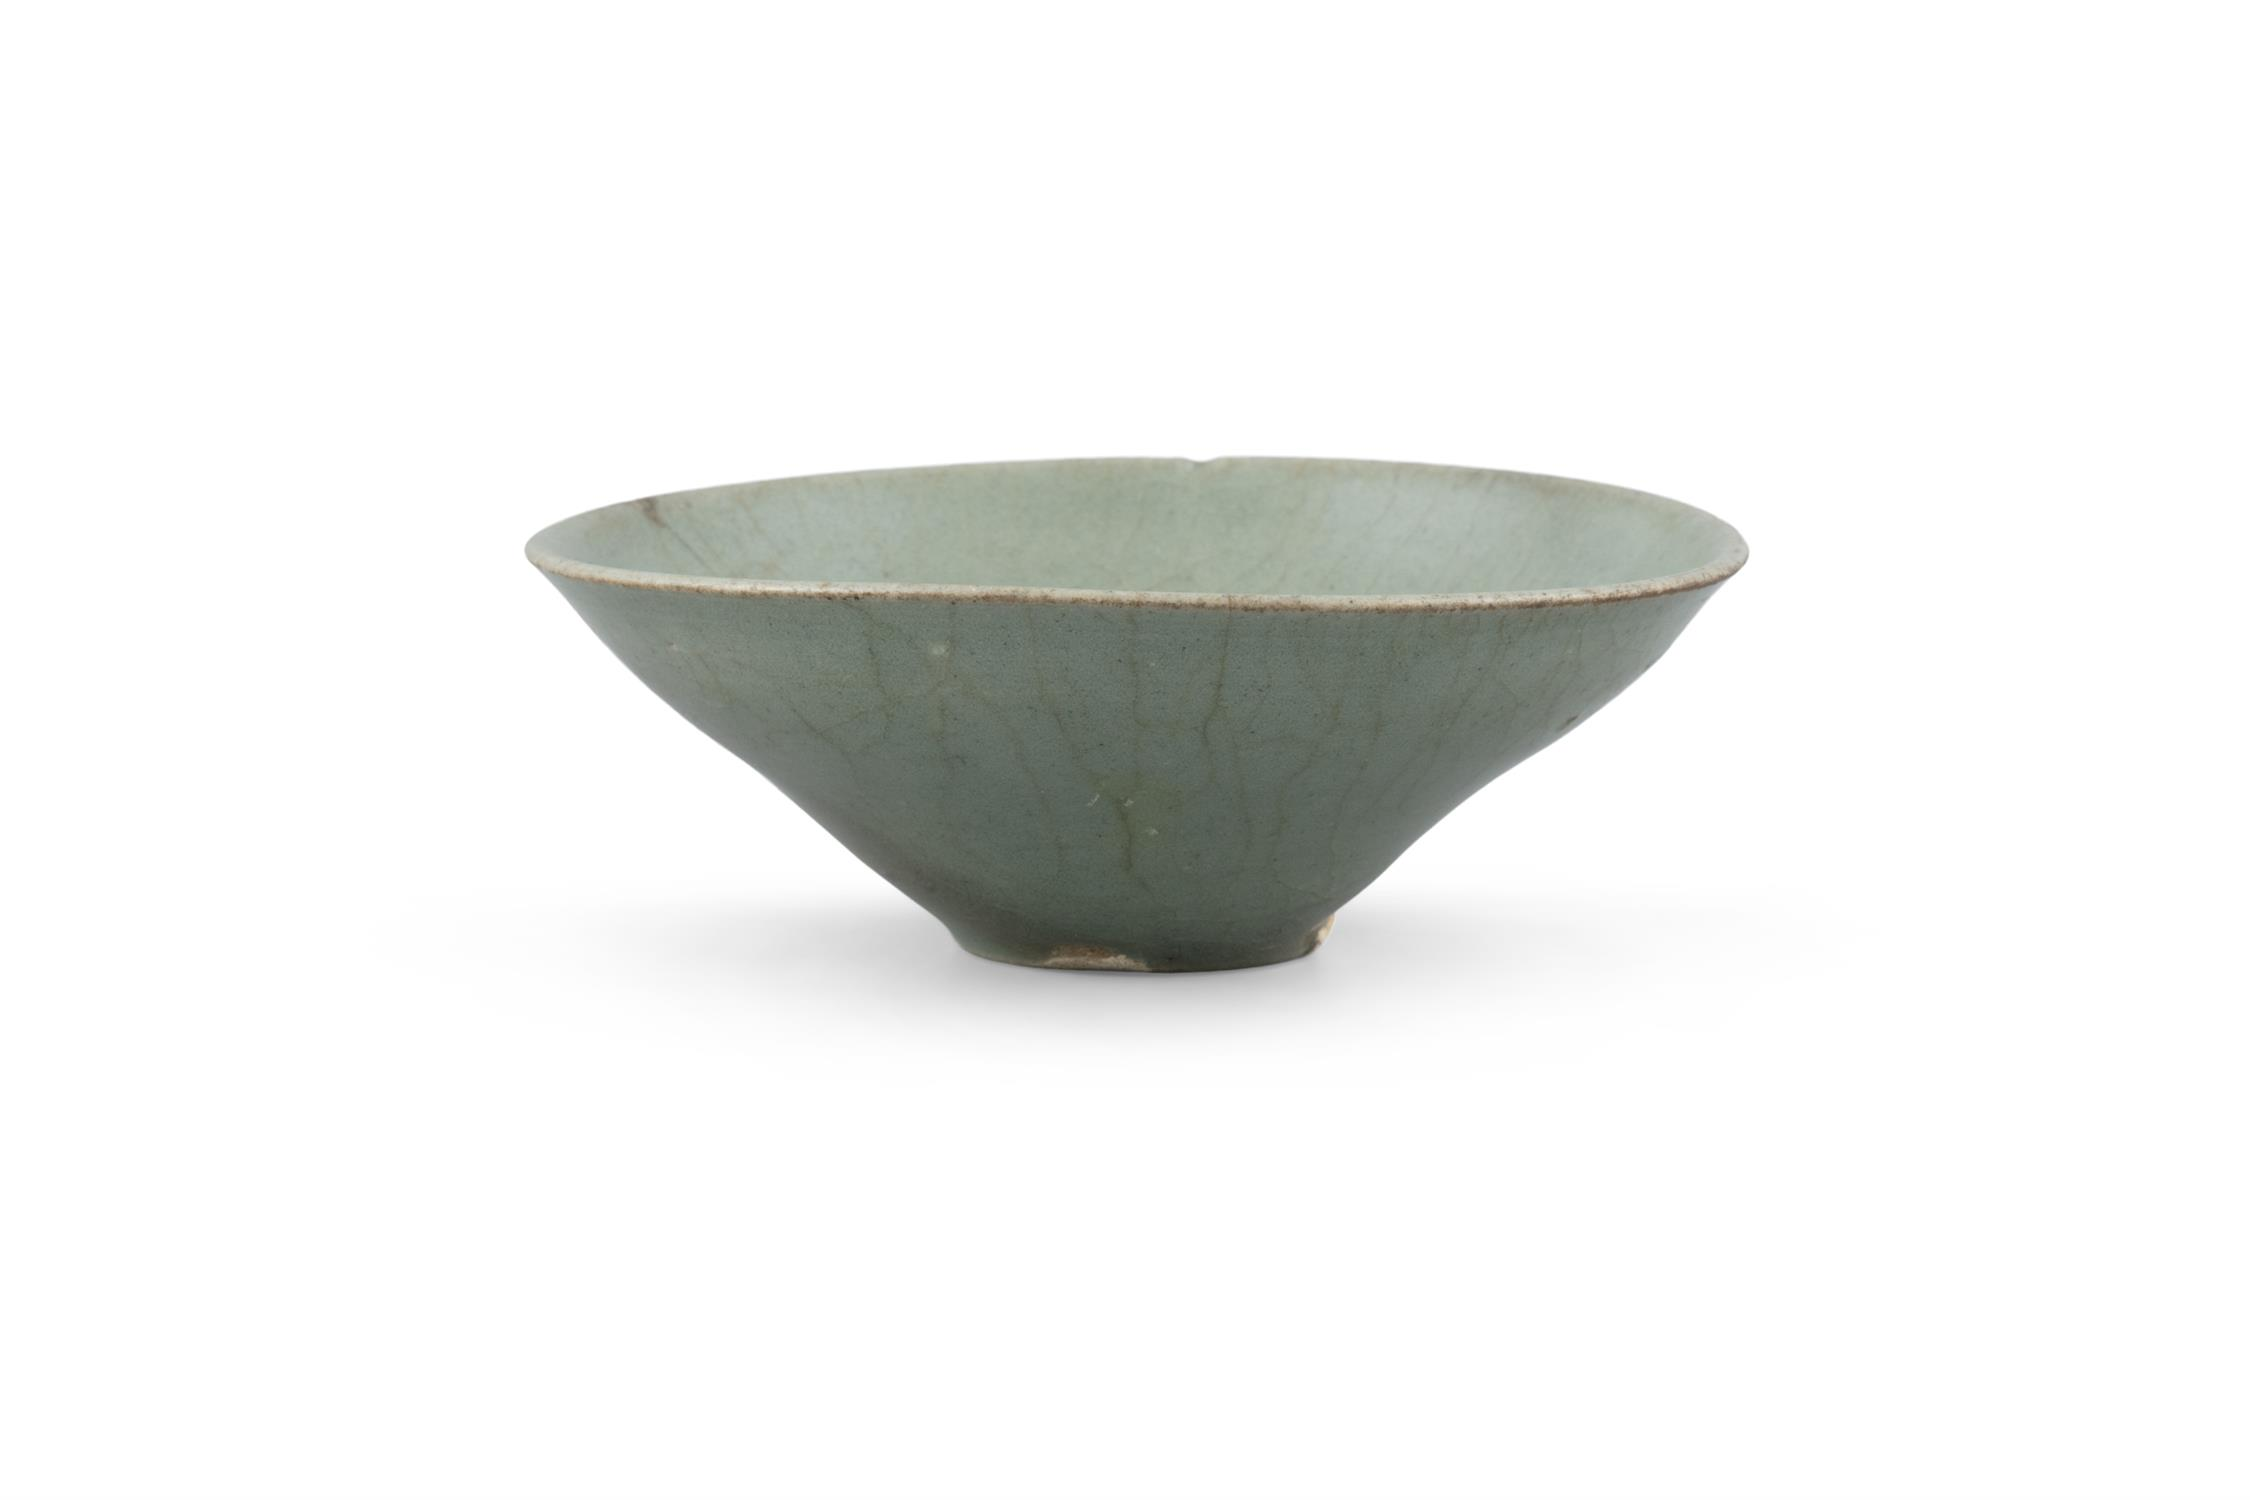 A CONICAL SHAPED CELADON GLAZED STONEWARE BOWL Korea, Joseon Dynasty H: 5cm - D: 13.3cm - Image 5 of 8